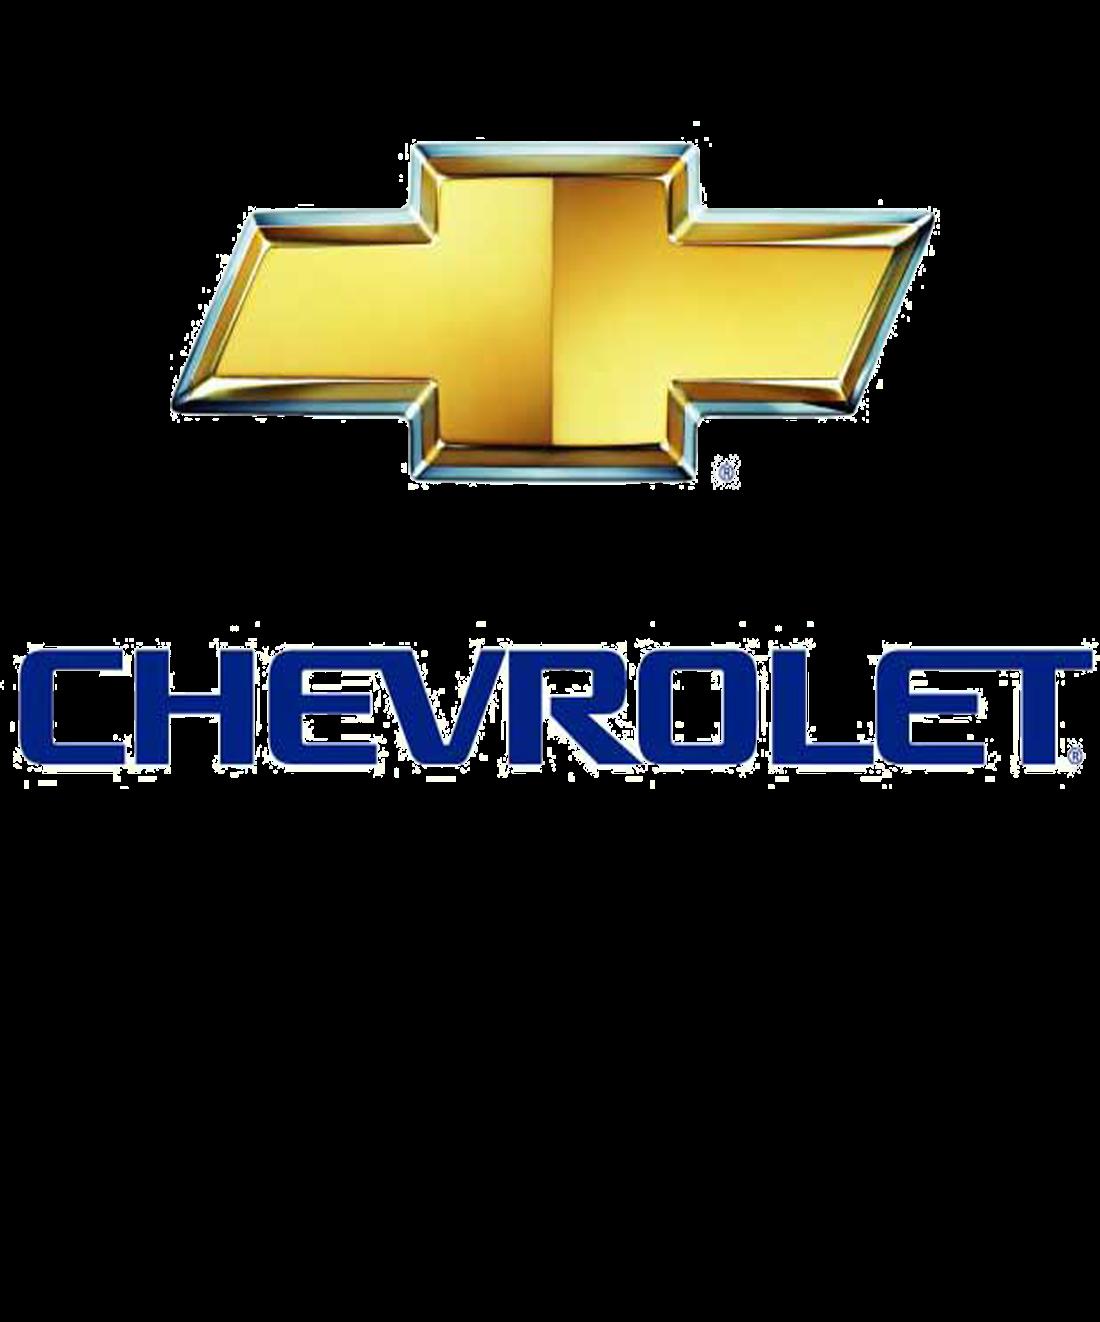 Shift cable repair kit fits Chevrolet Silverado, Avalanche, Impala, Trailblazer, Uplander, Cavalier, Venture, SSR